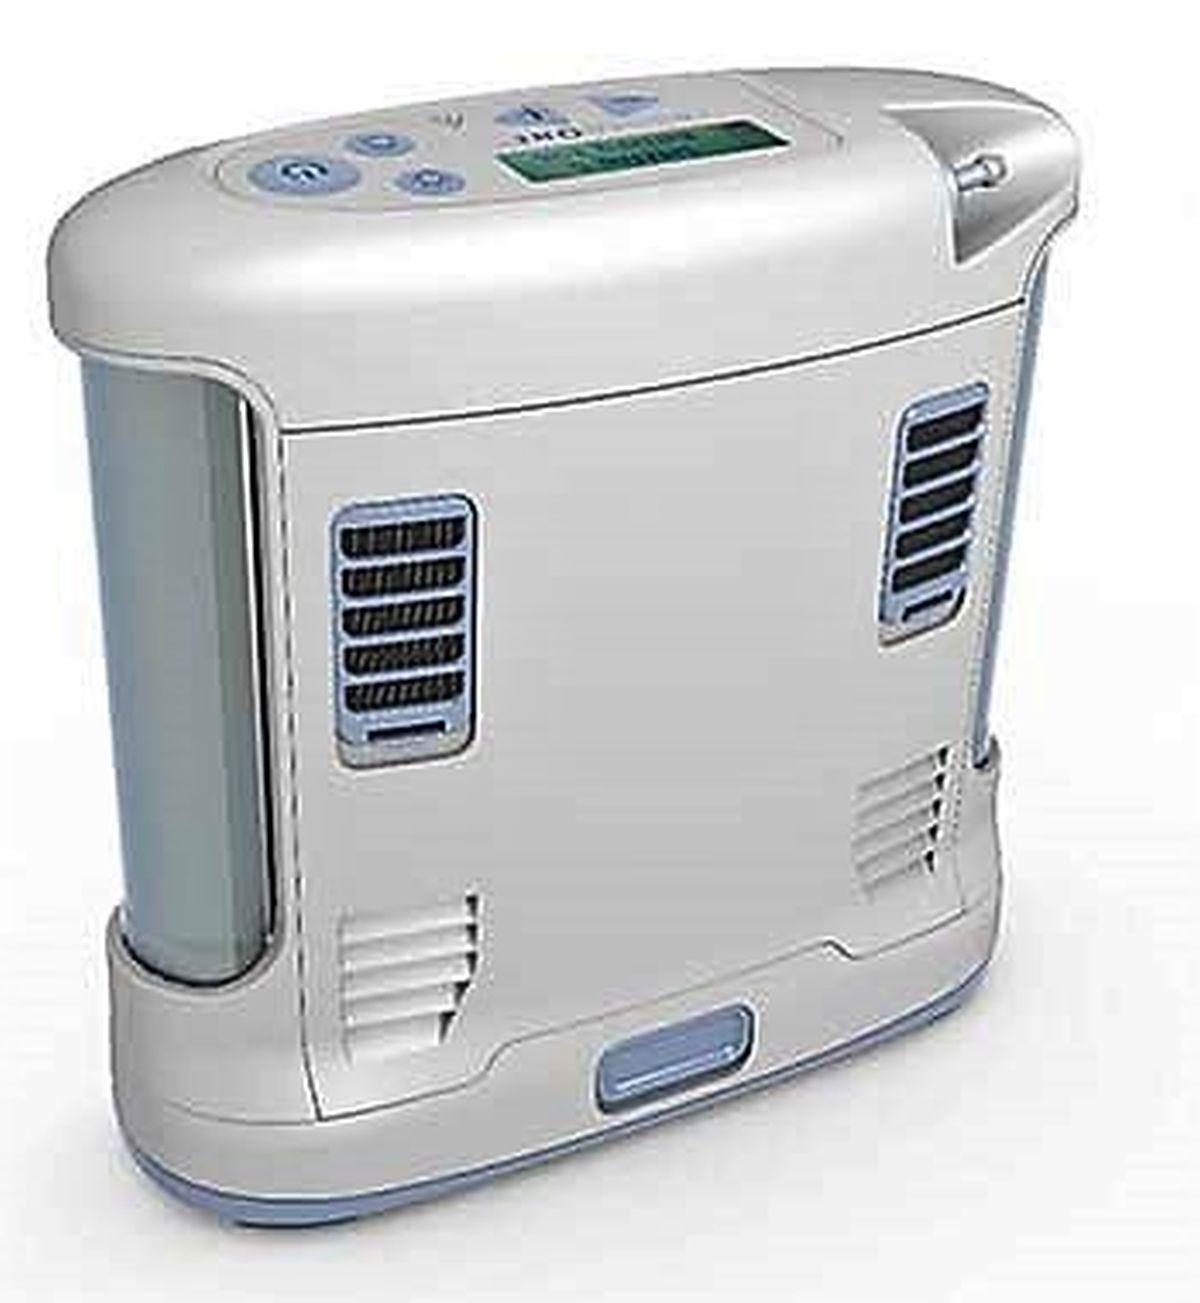 Best Portable Oxygen Concentrators 2019 (UPDATED)